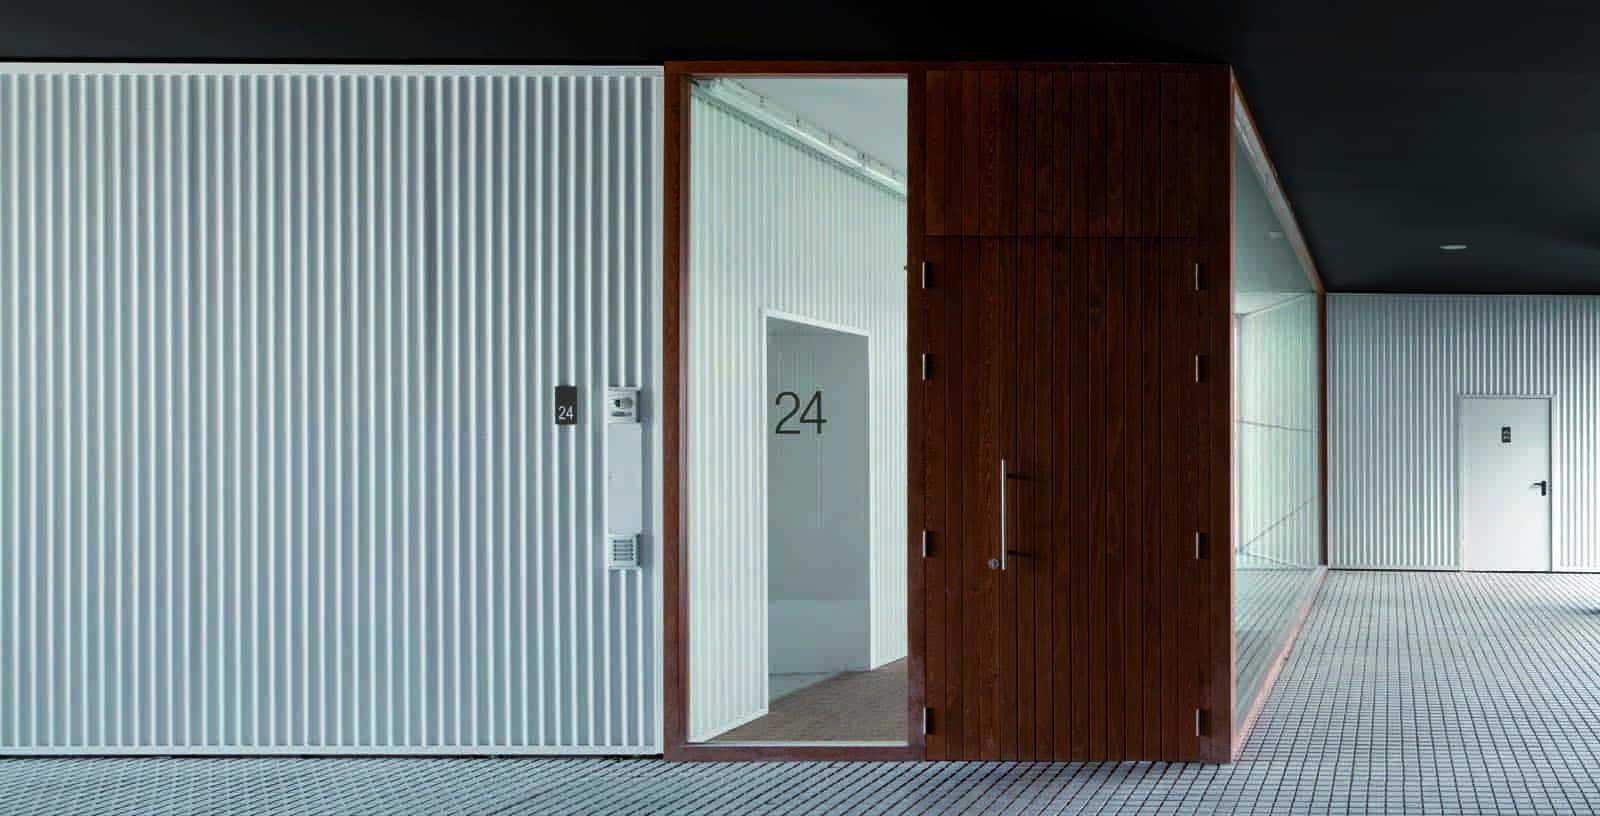 Subsidized_flats_in_Borinbizkarra_04_Architecture_IDOM_photos_Aitor_Ortiz